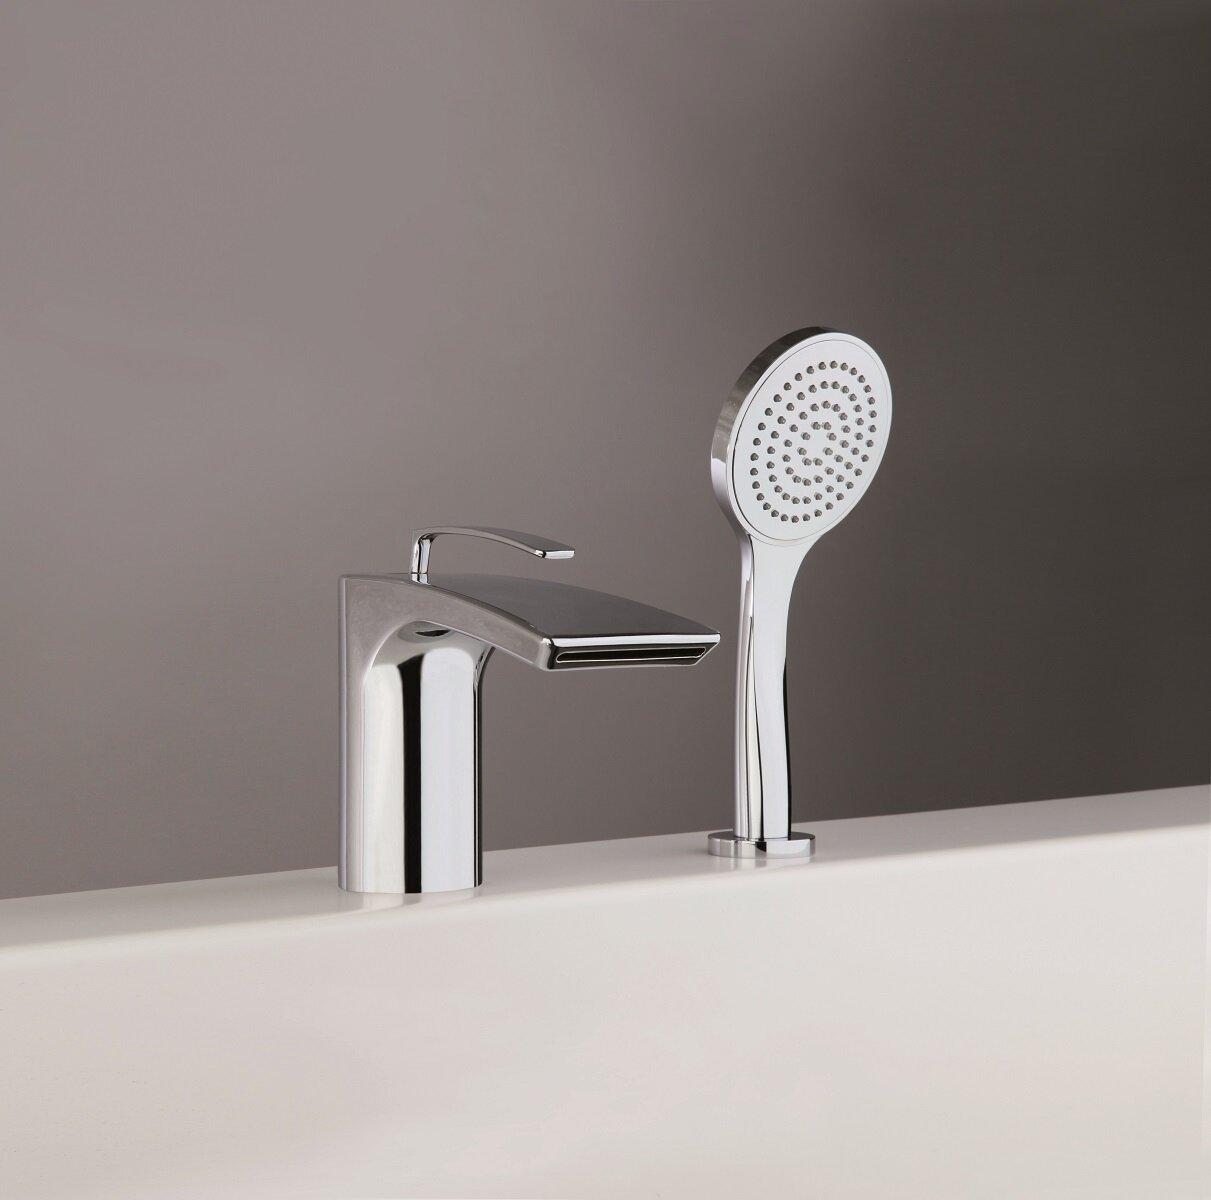 Aquatica Bollicine Single Handle Deck Mounted Roman Tub Faucet Trim Trim With Handshower Wayfair